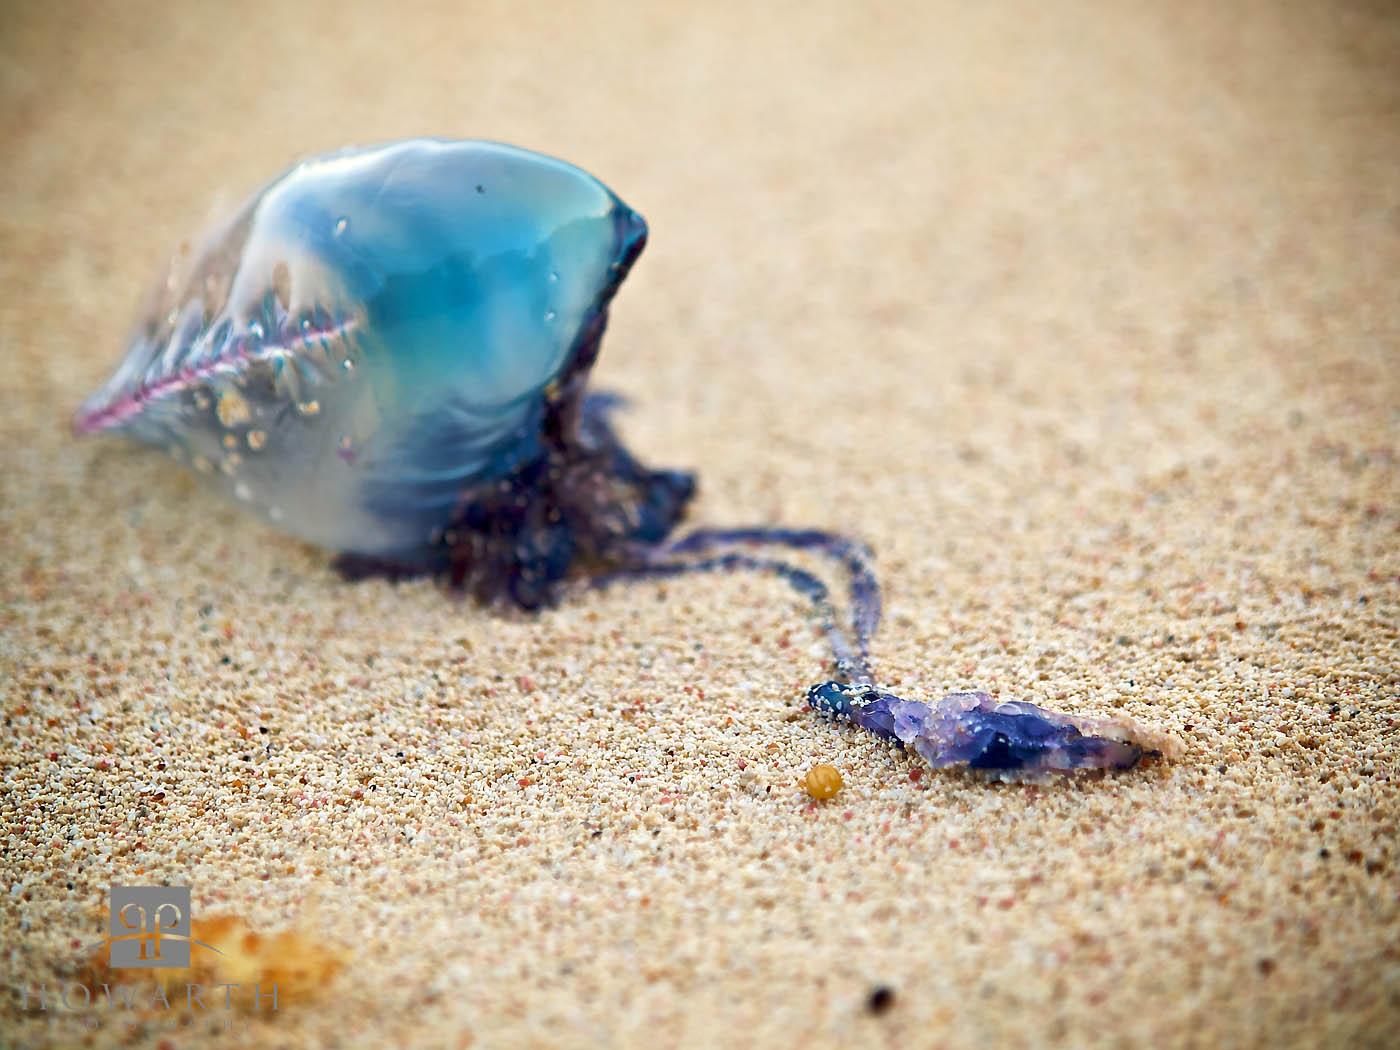 portuguese, man, war, beach, sand, pink, blue, photo